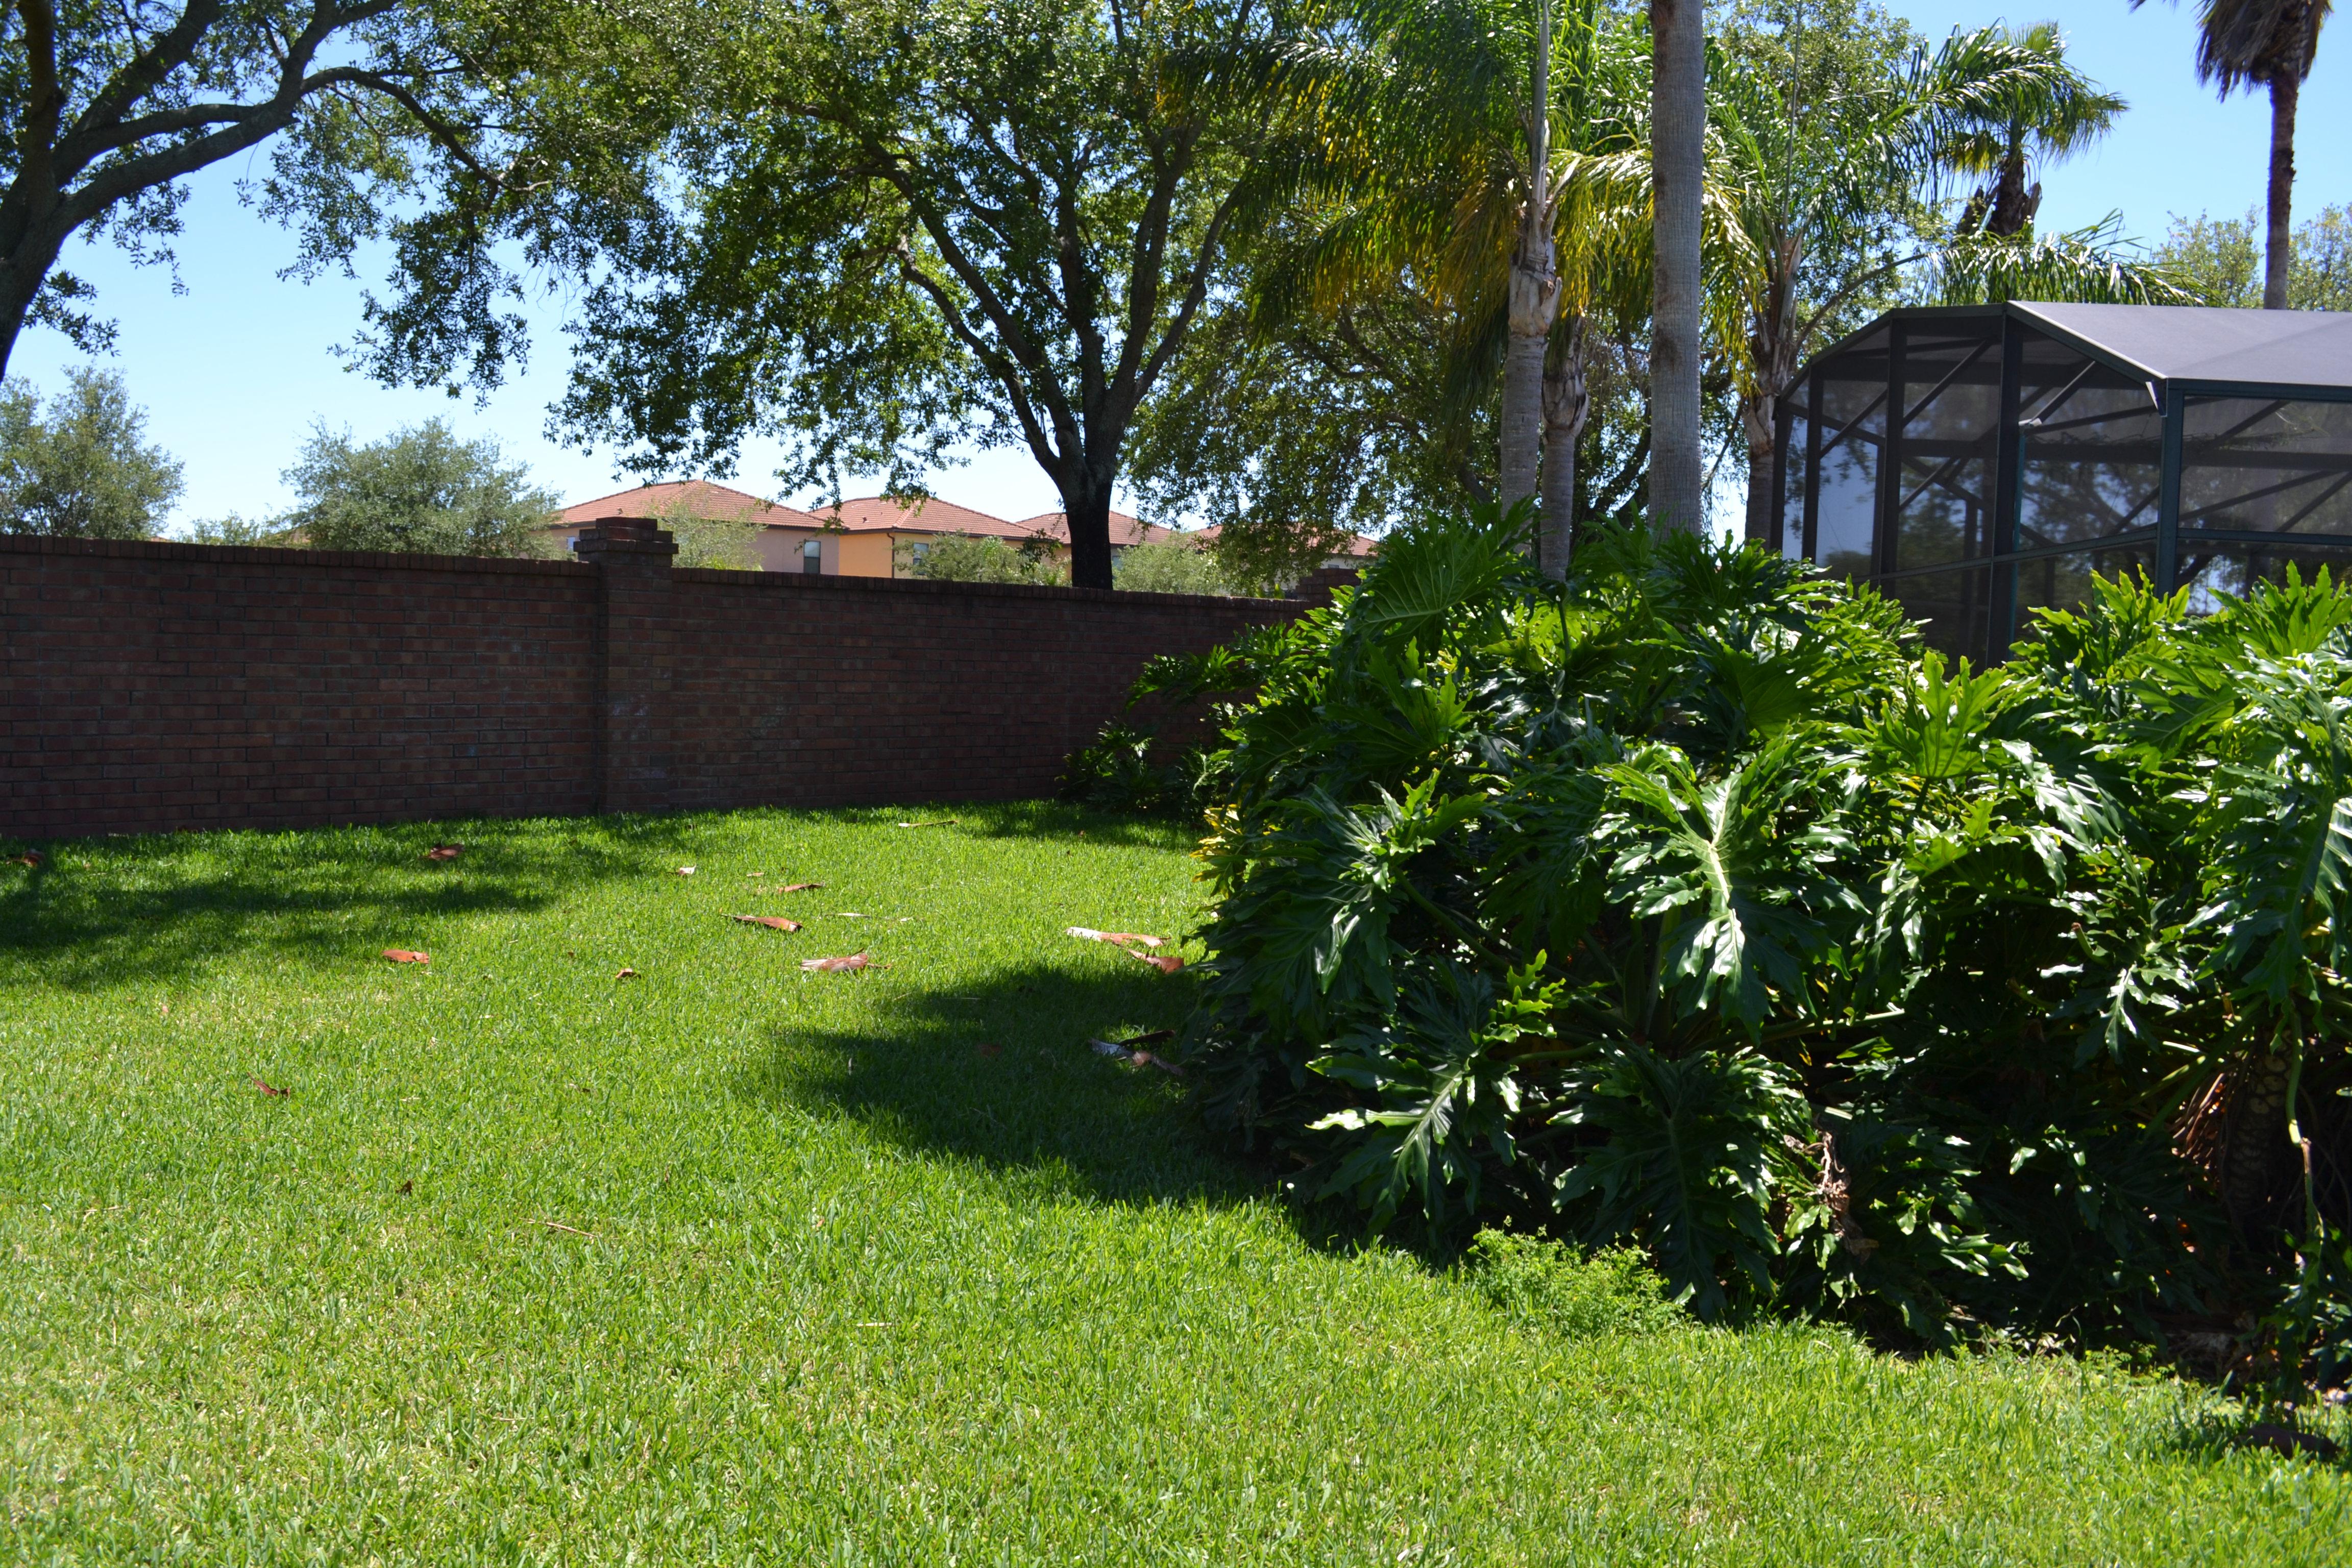 Photo of 1757 Slough Court, Ocoee, FL, 34761